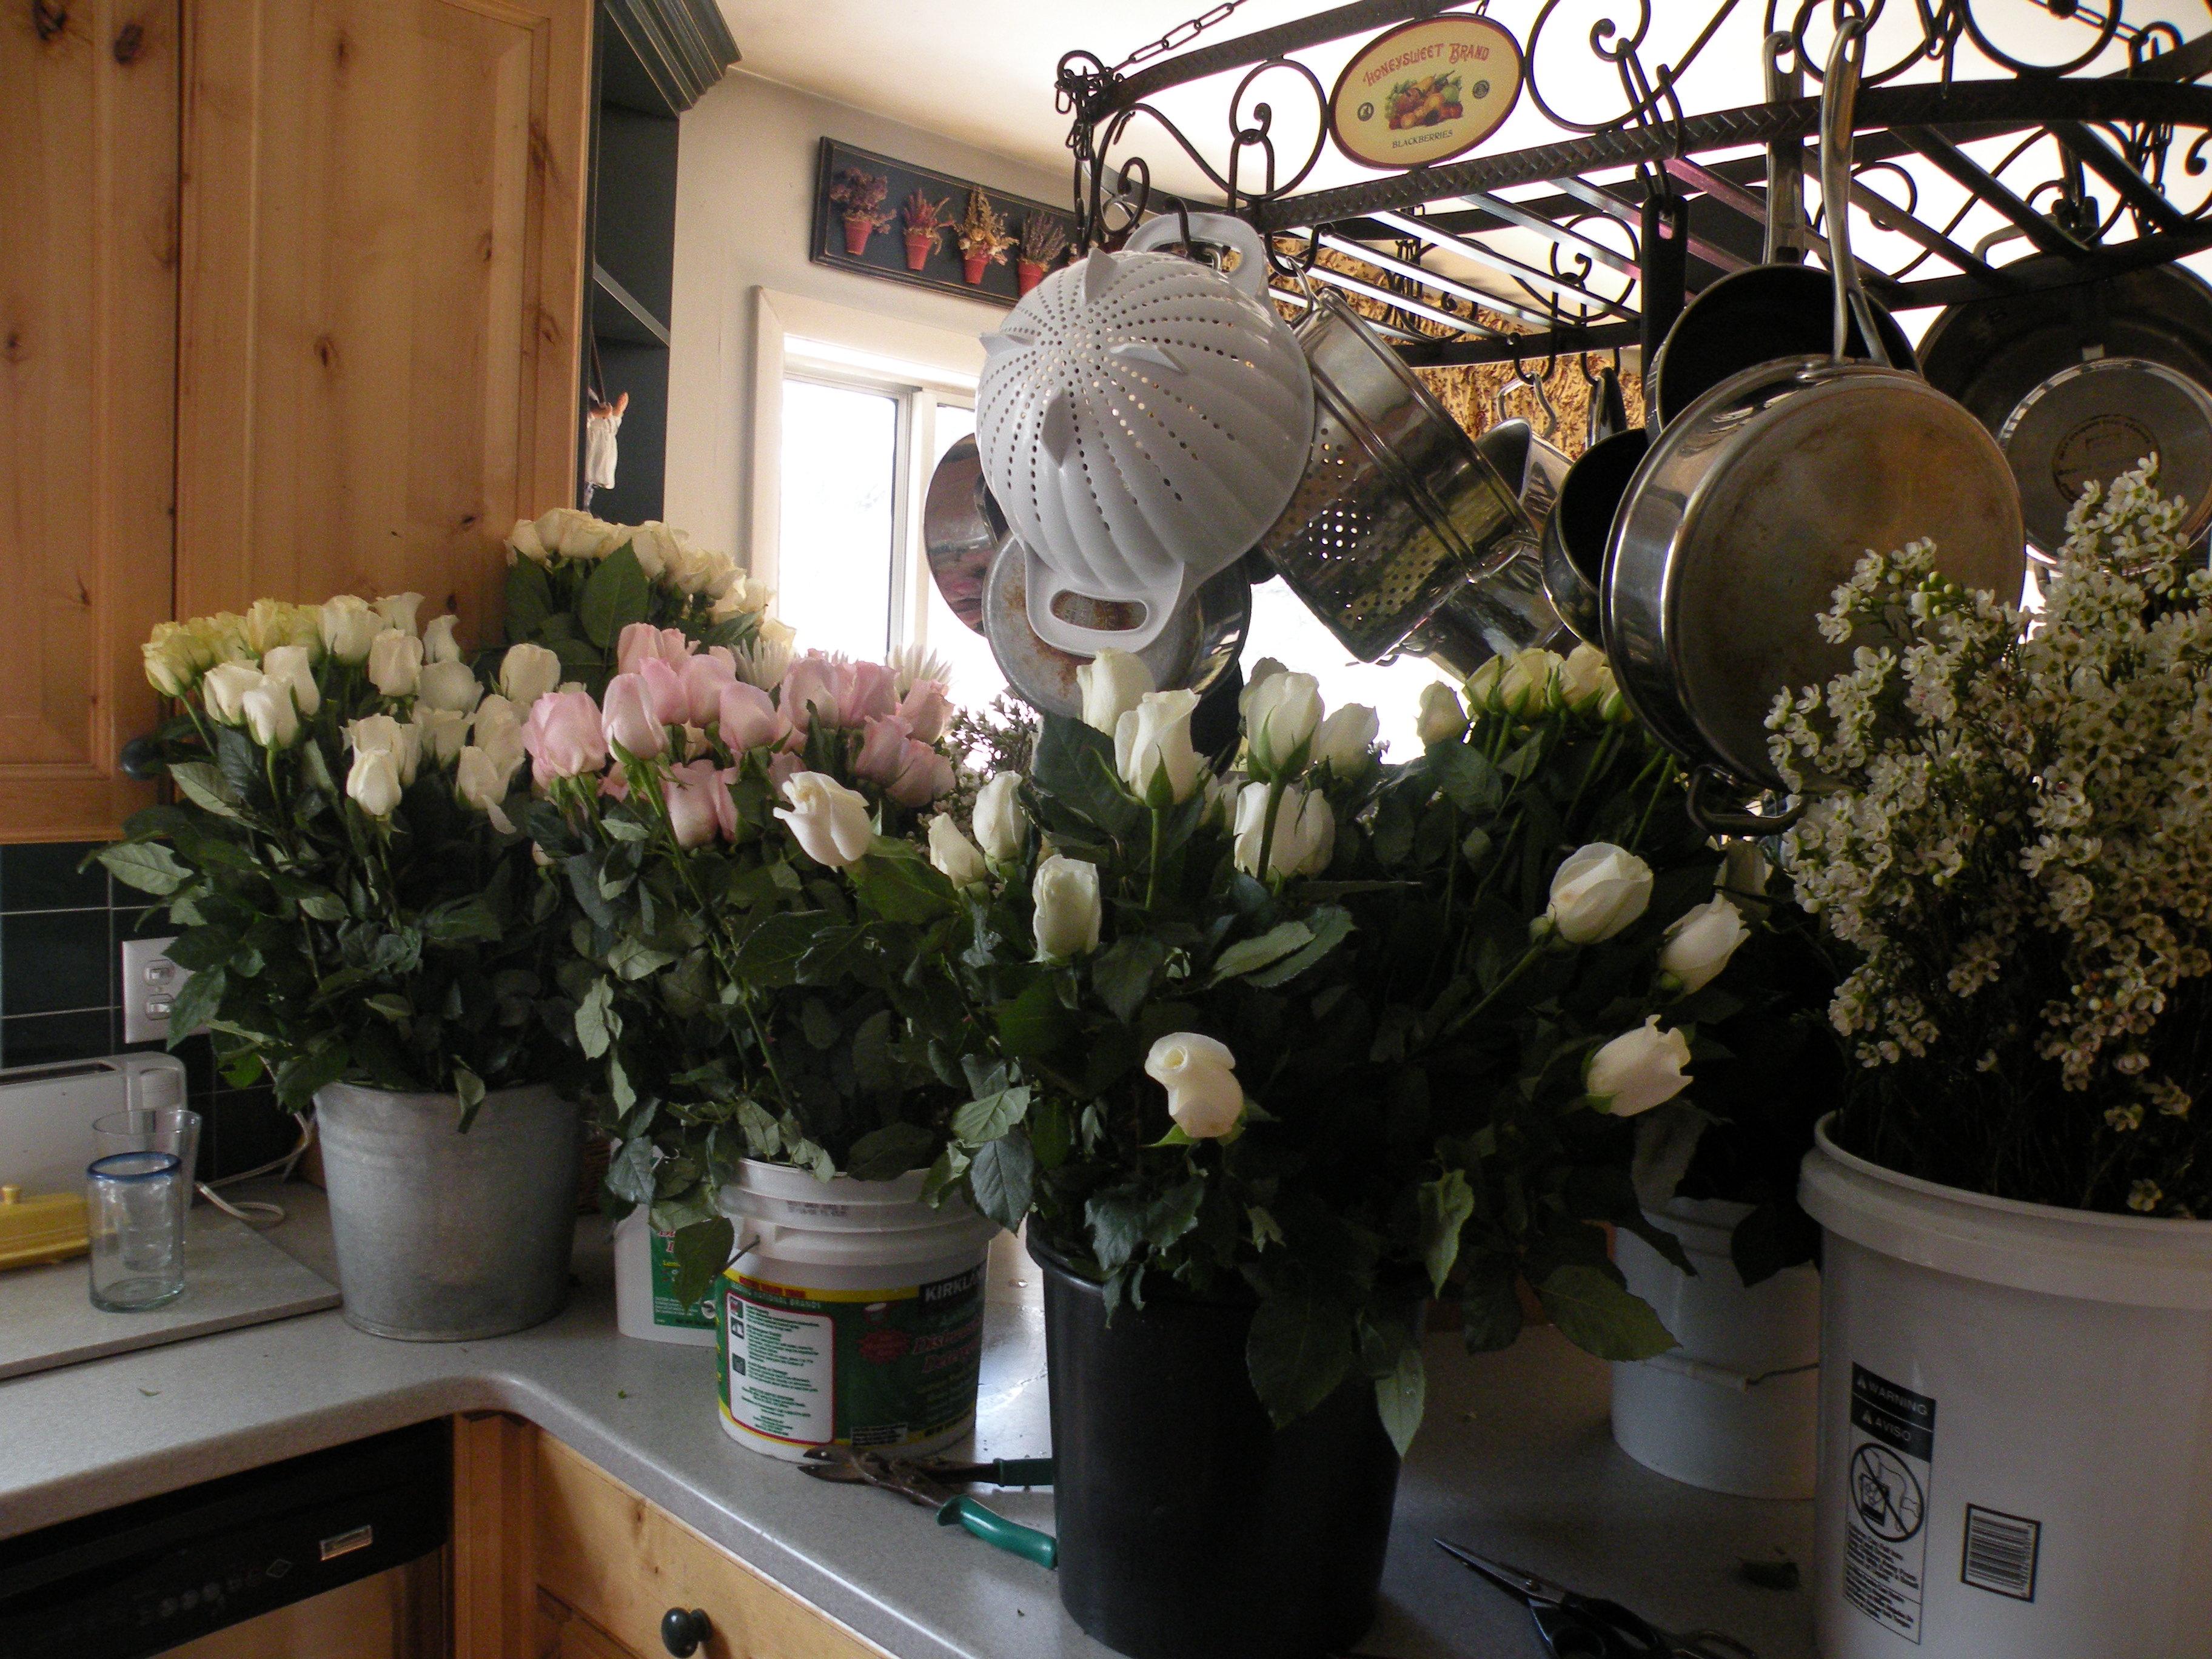 pots and pins, creativity, quilts, diy projects, grandbabies, parties